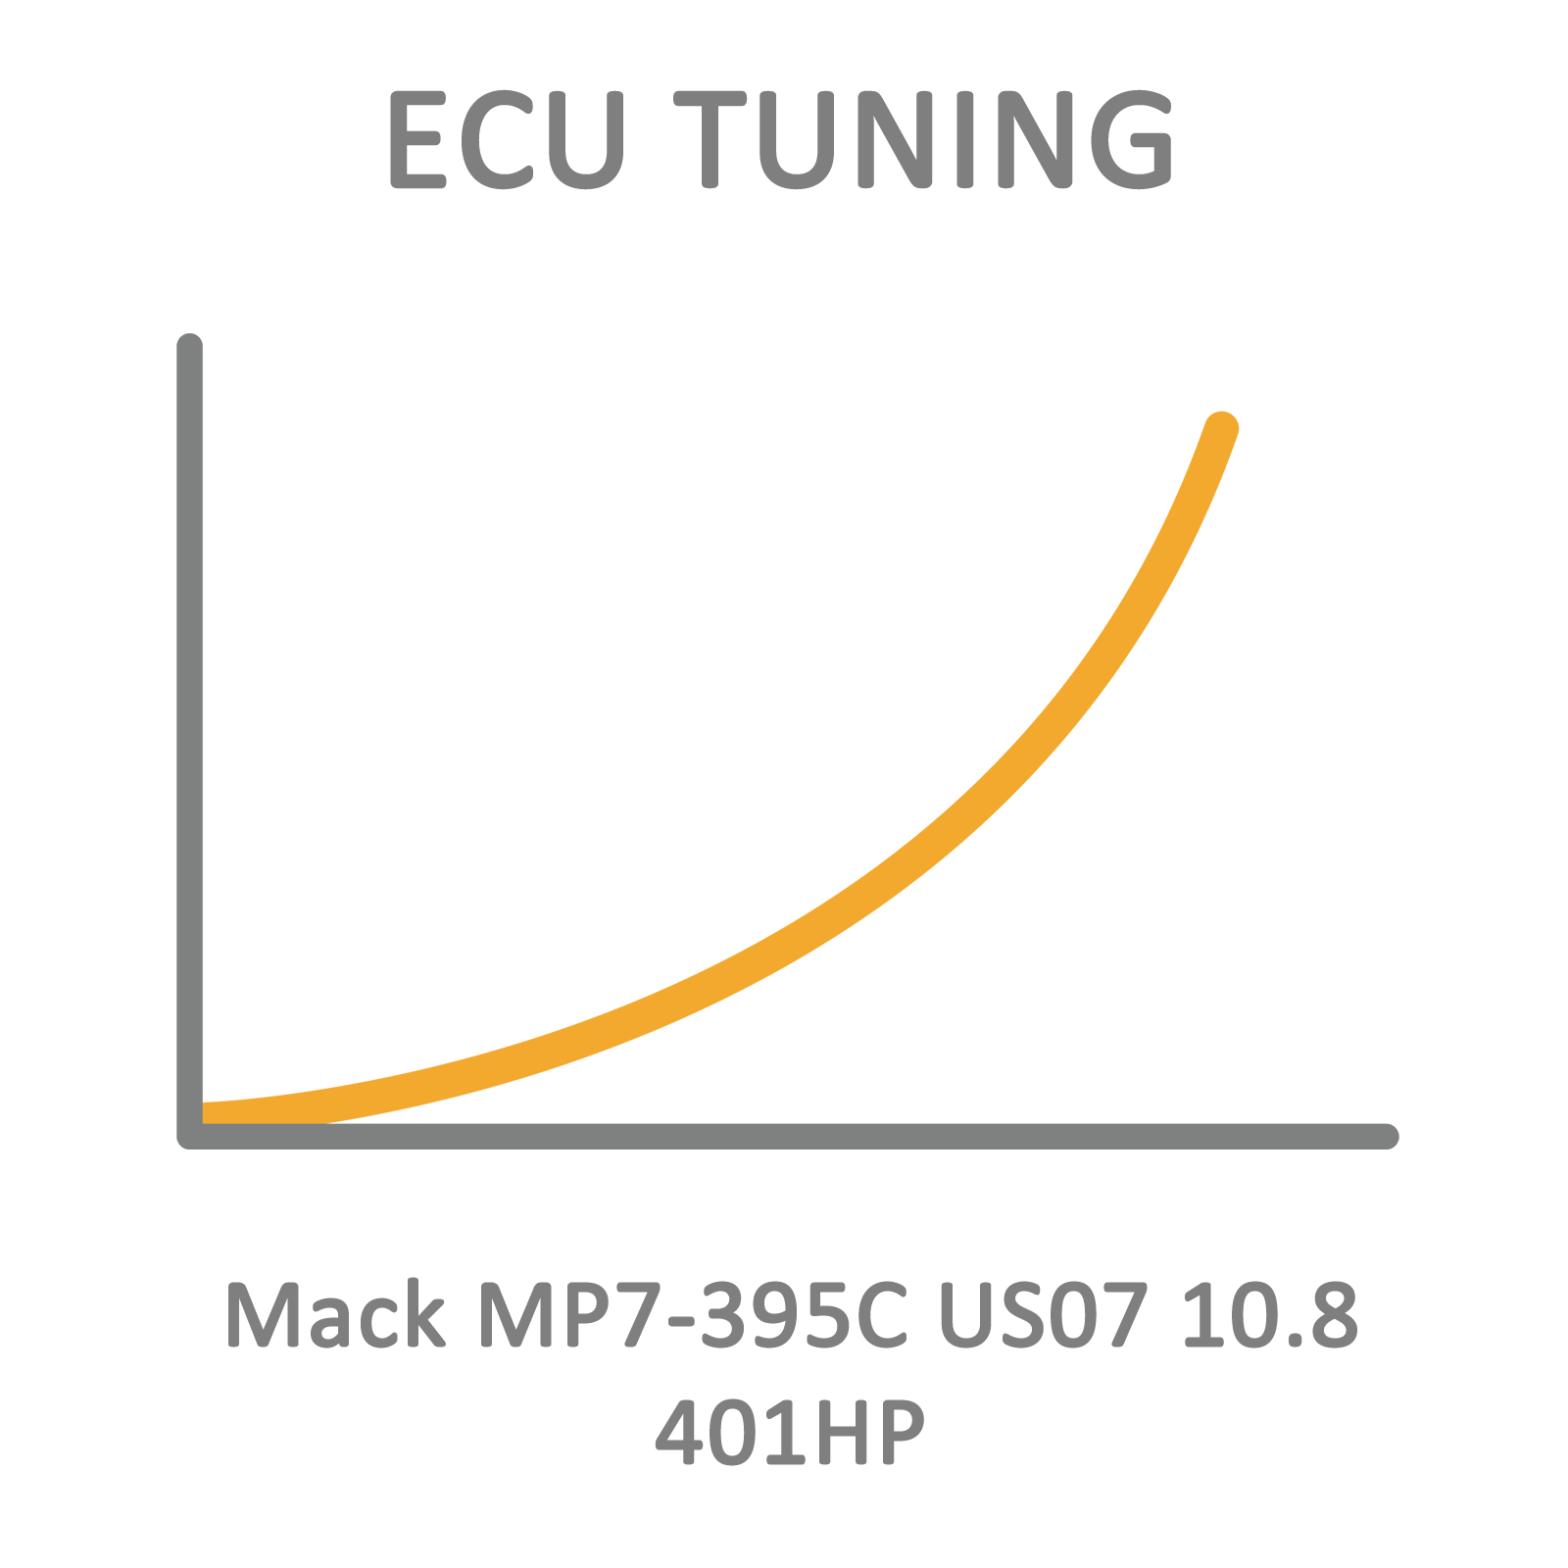 Mack MP7-395C US07 10.8 401HP ECU Tuning Remapping Programming